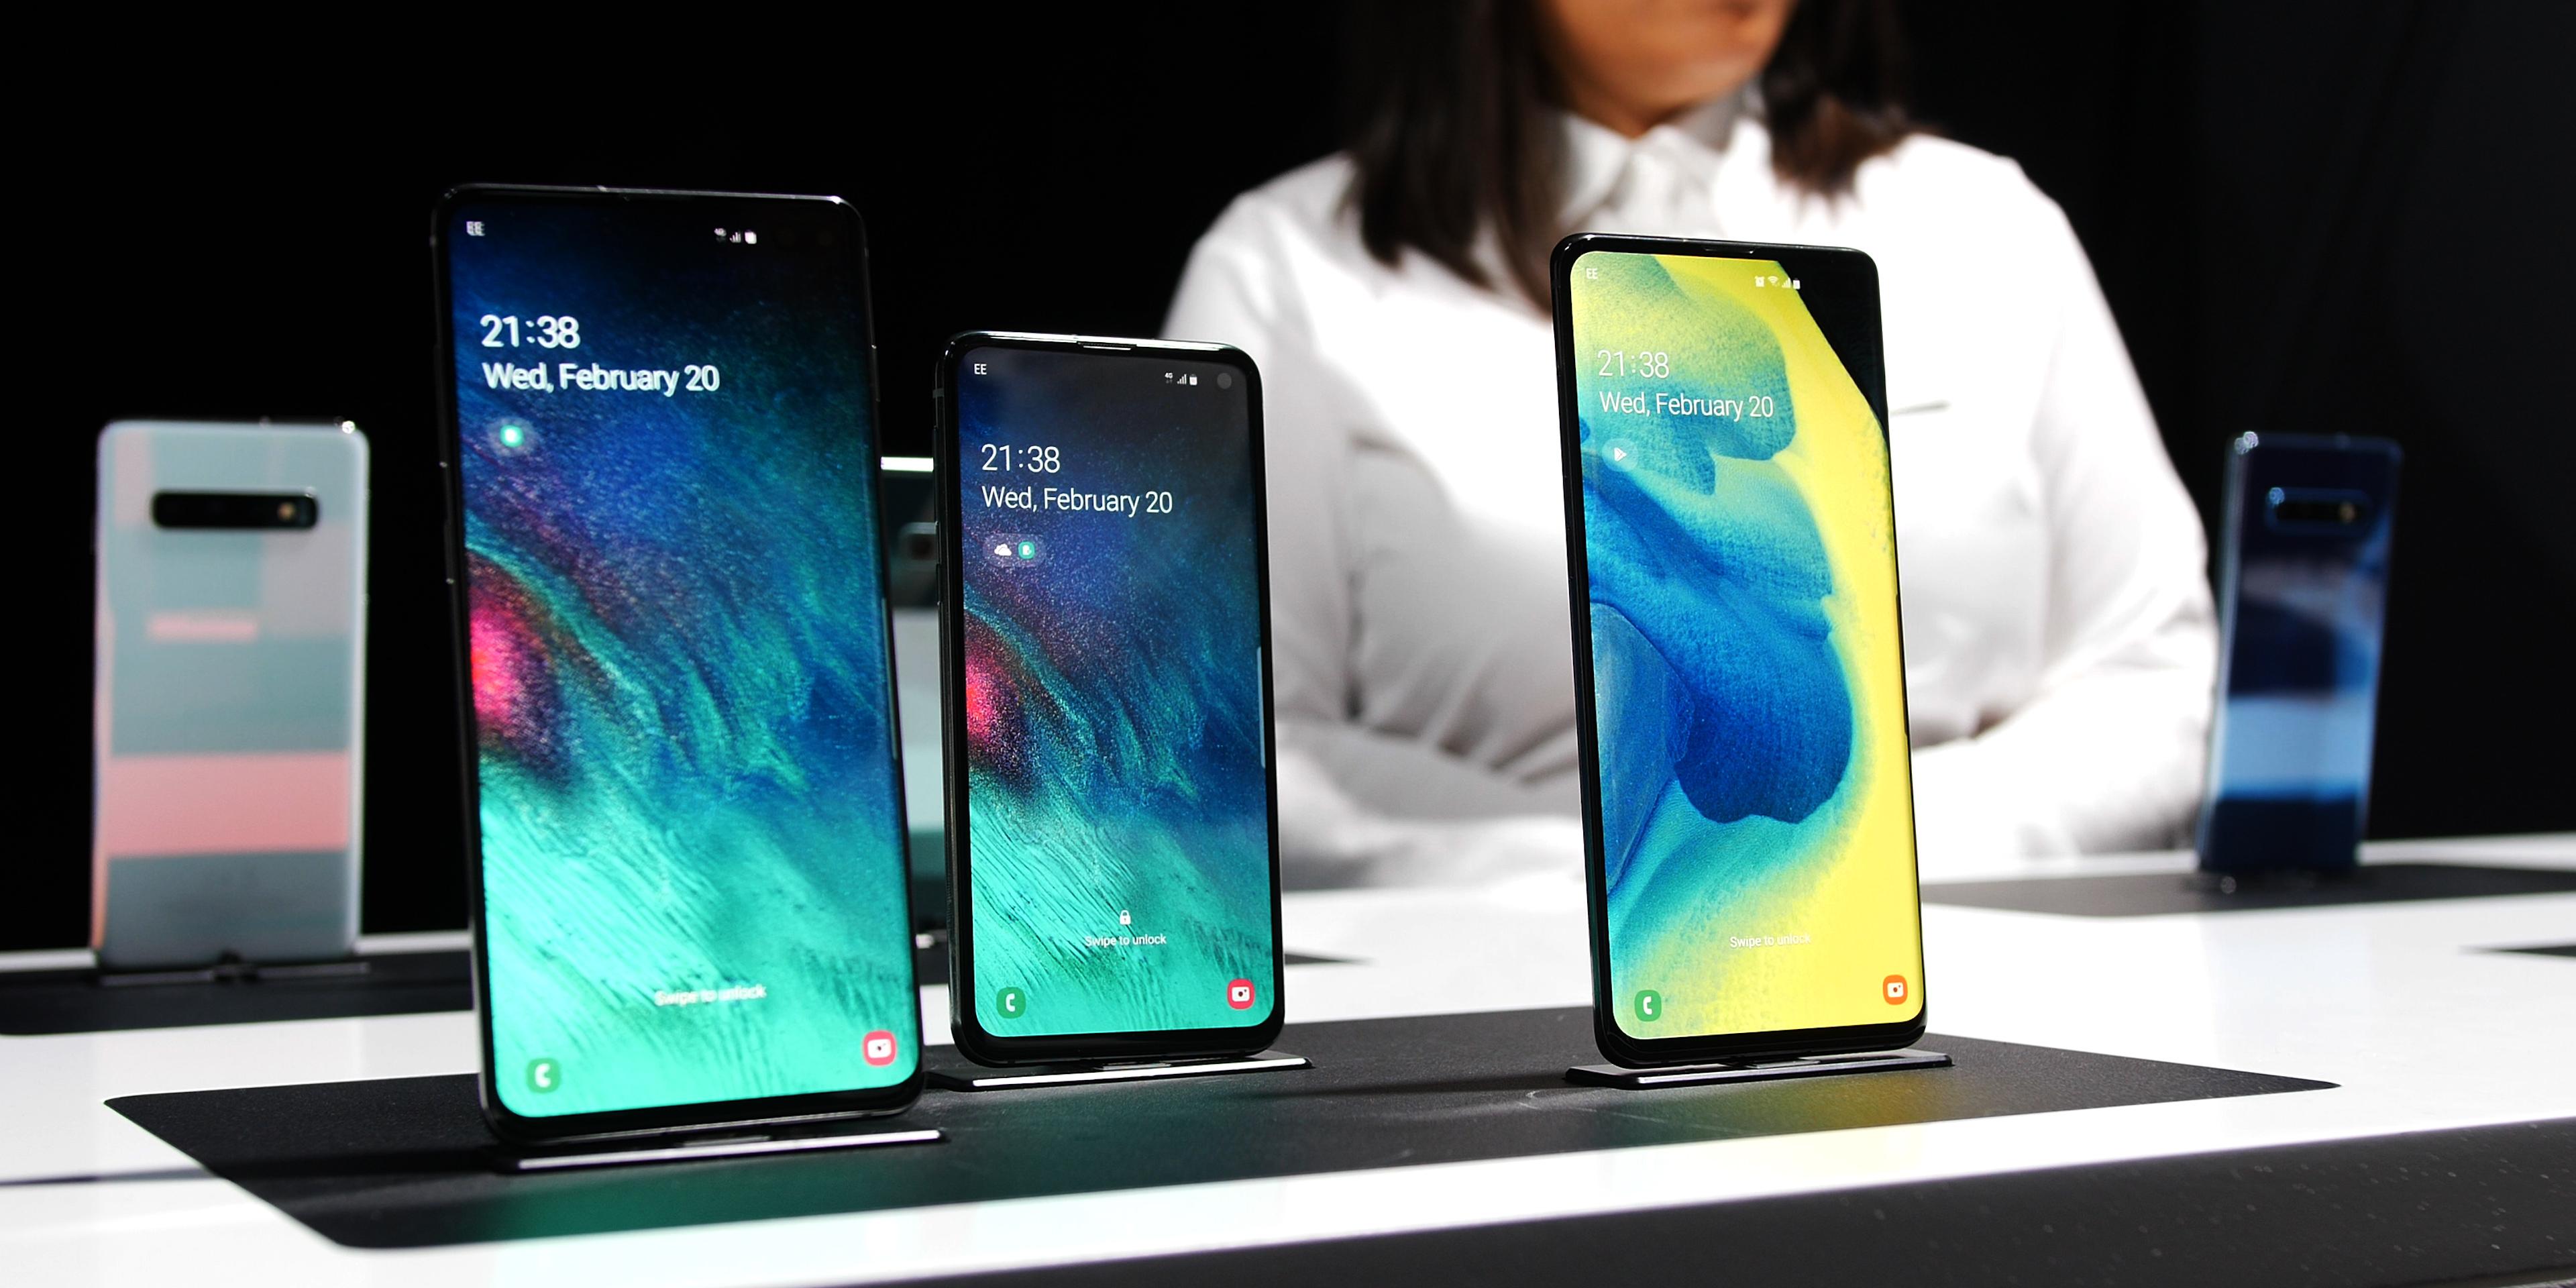 Samsung Galaxy S10 lineup